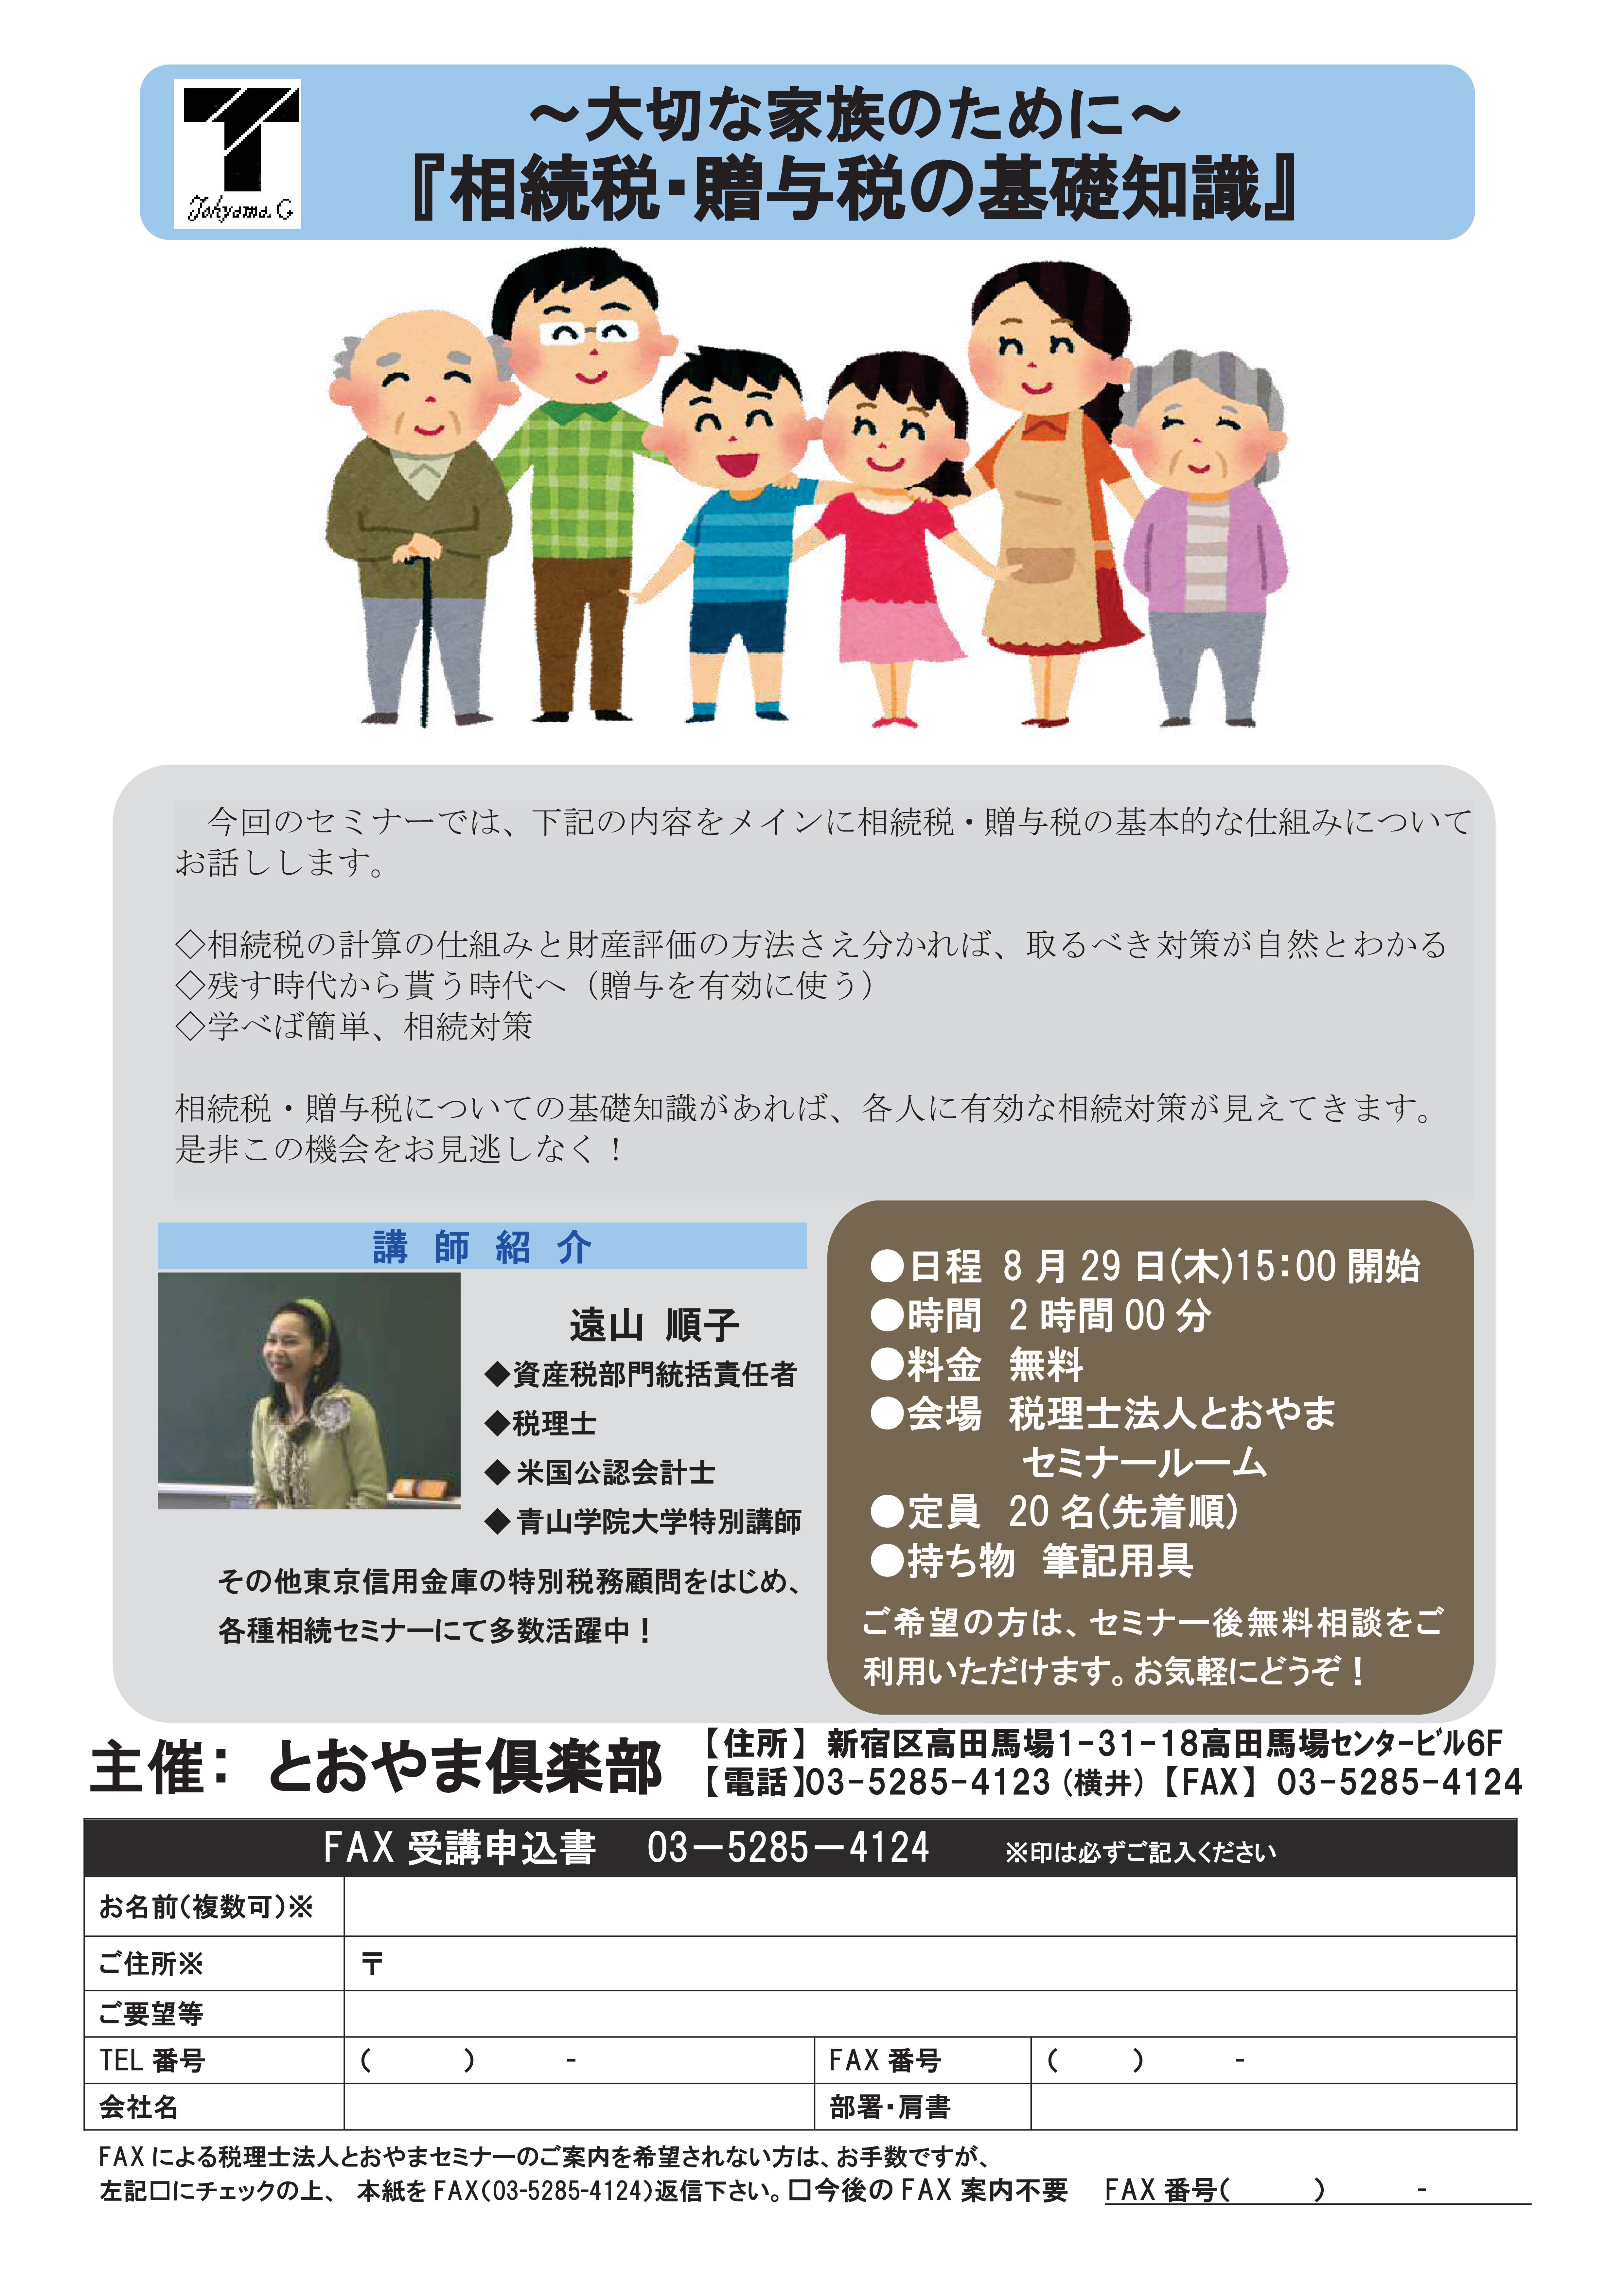 8月29日開催 『相続税・贈与税の基礎知識』